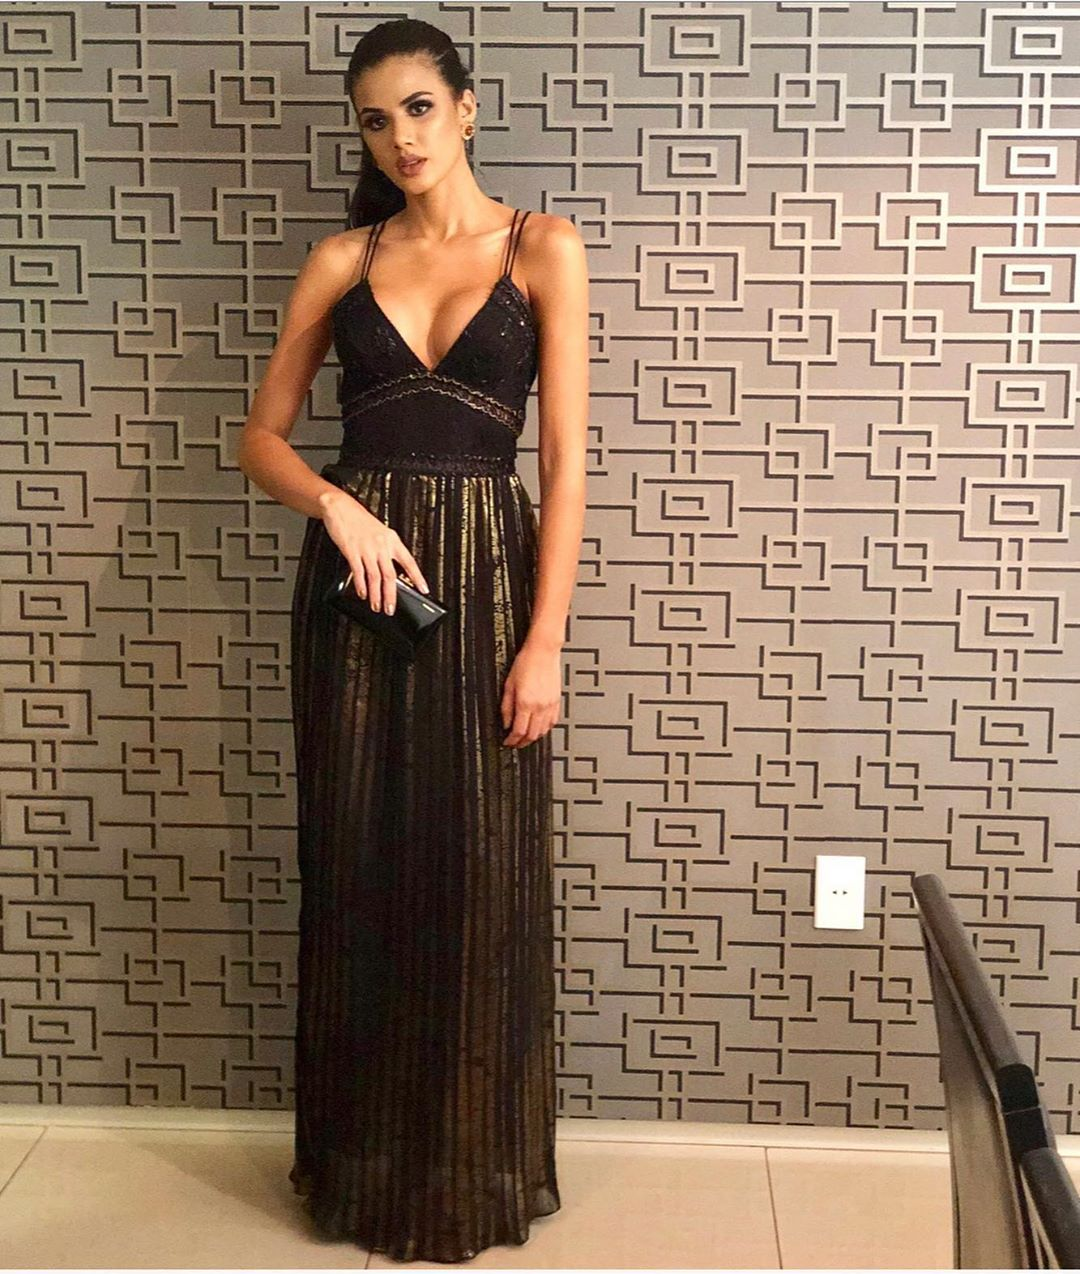 dagmara landim, top 10 de miss brasil universo 2019. - Página 2 50831210